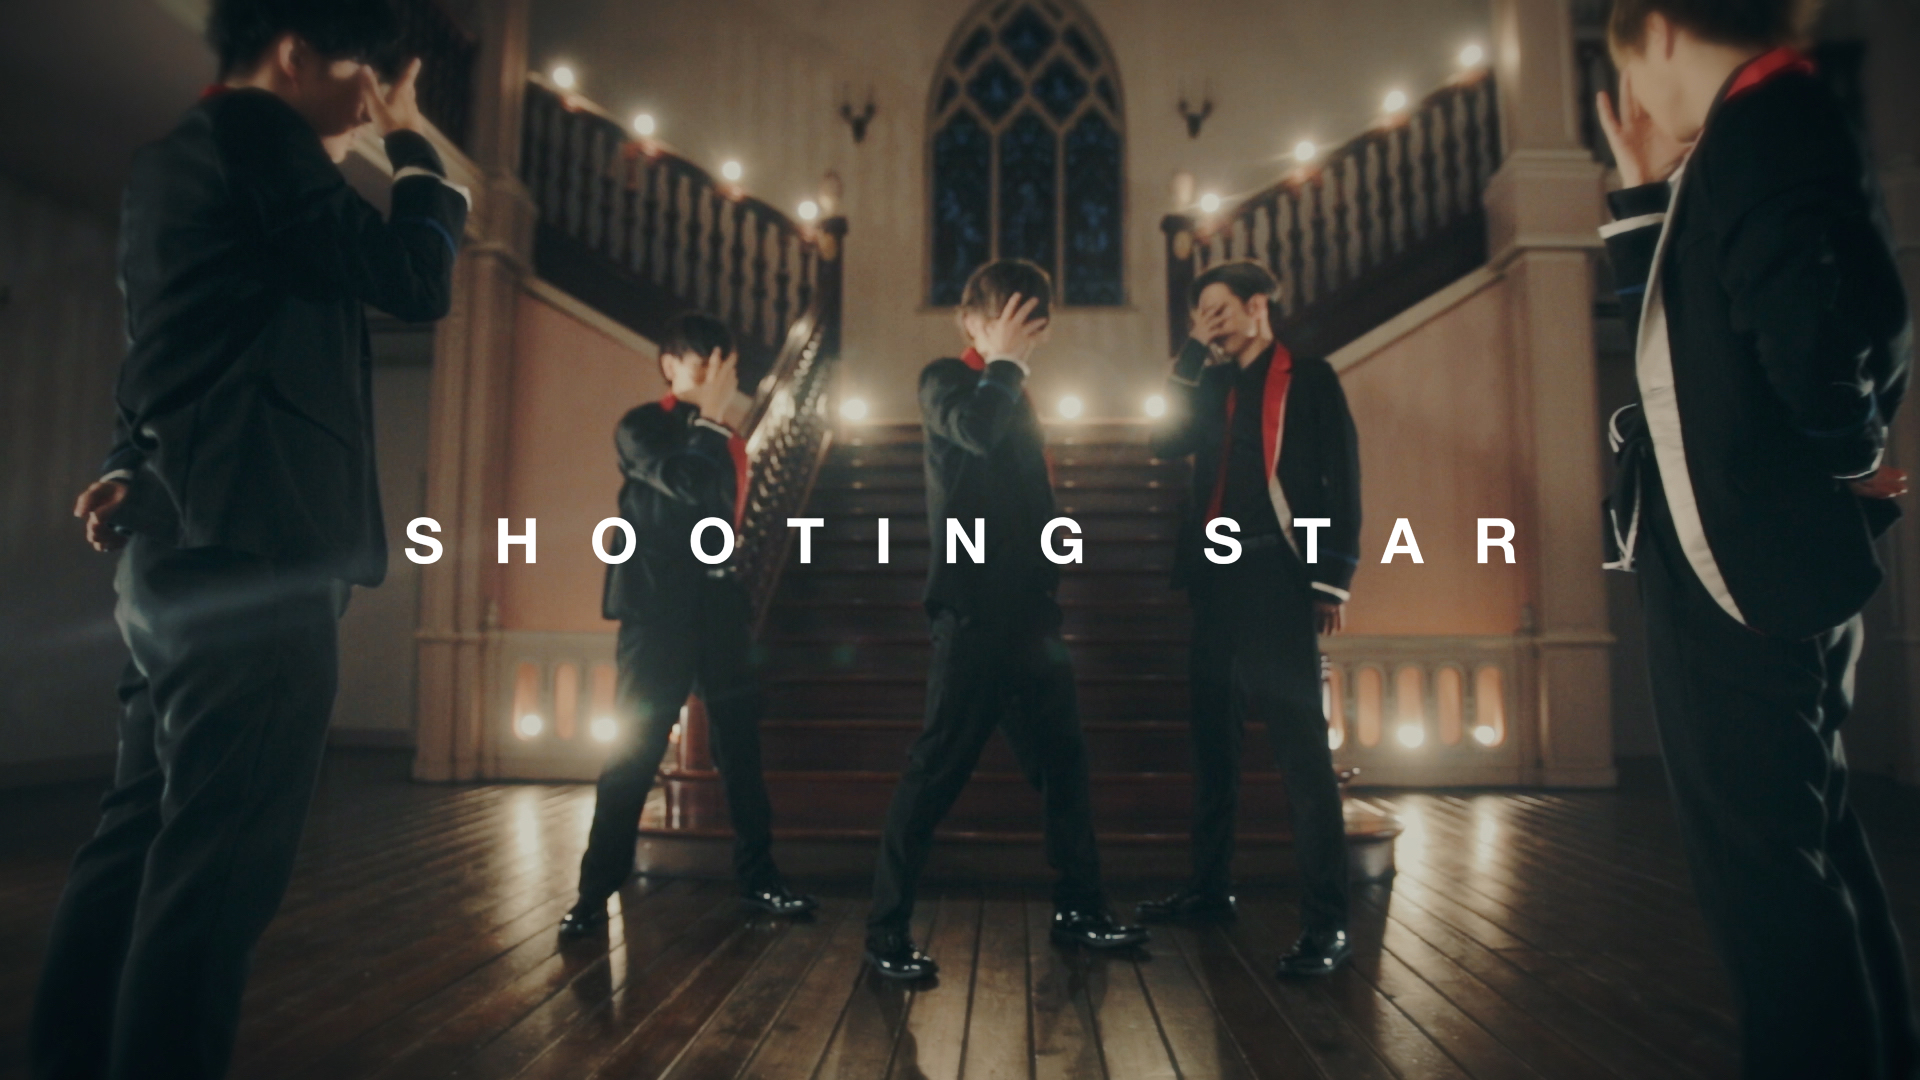 ★☆5th Single「SHOOTING STAR」ミュージックビデオ公開★☆